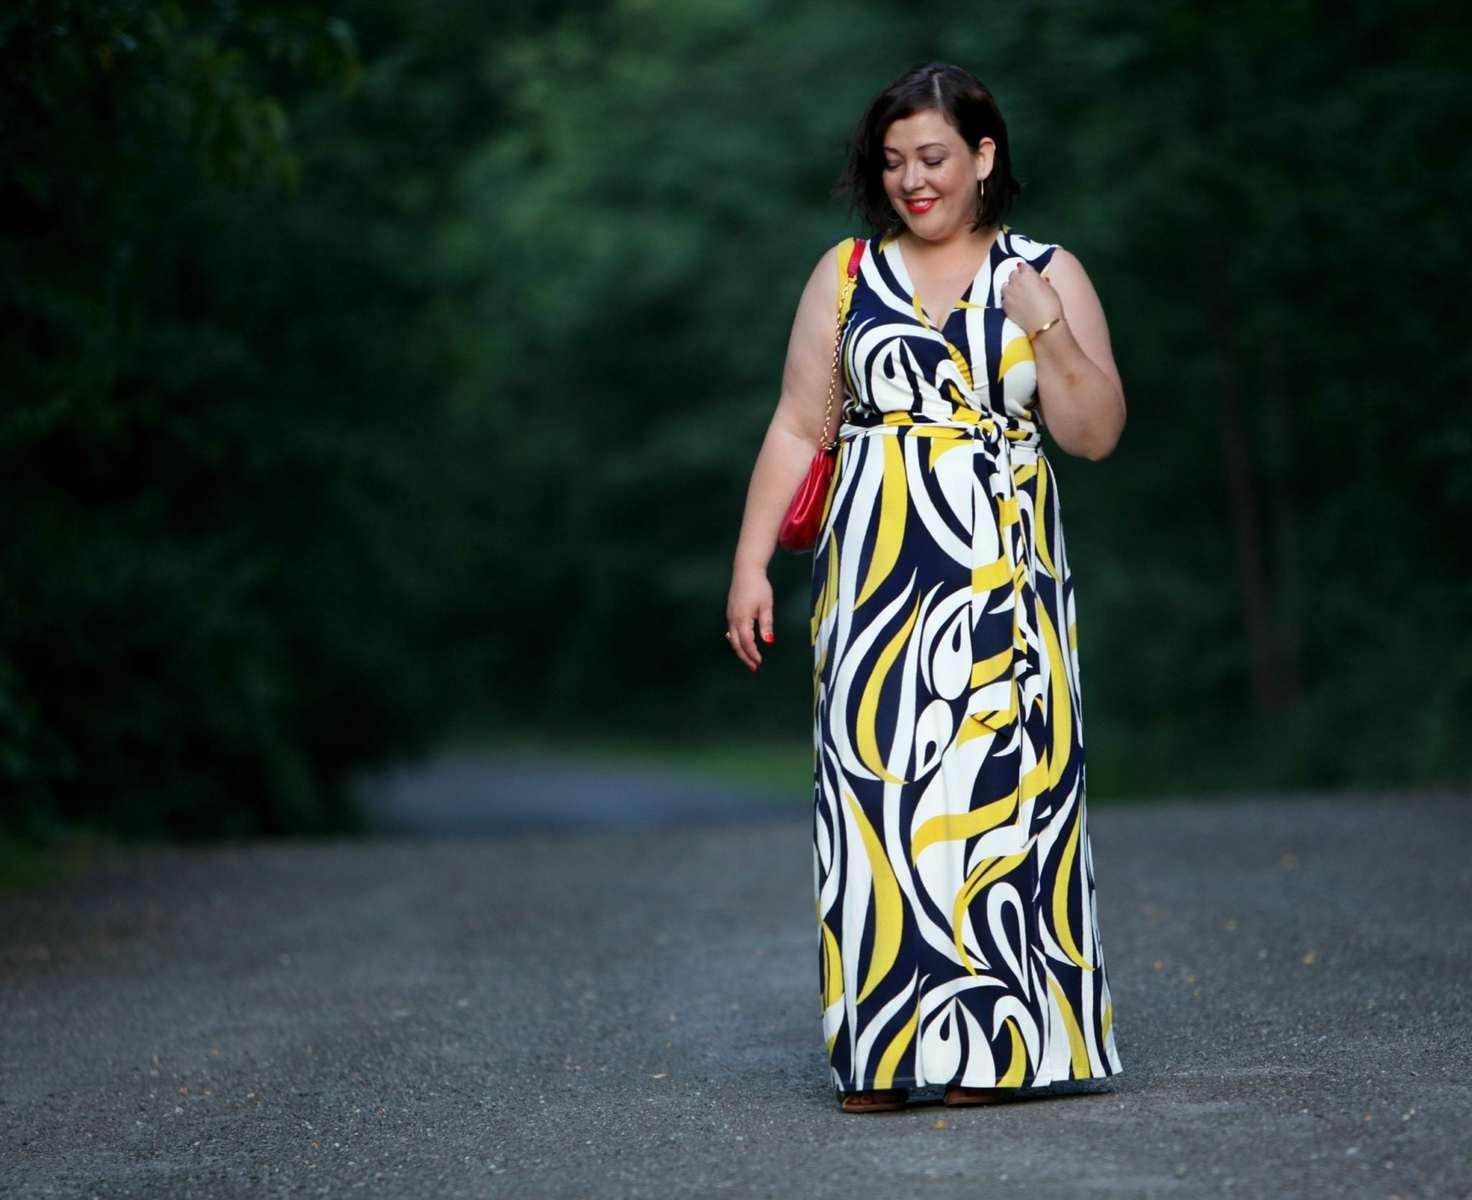 over 40 fashion blog wardrobe oxygen maxi dress boden